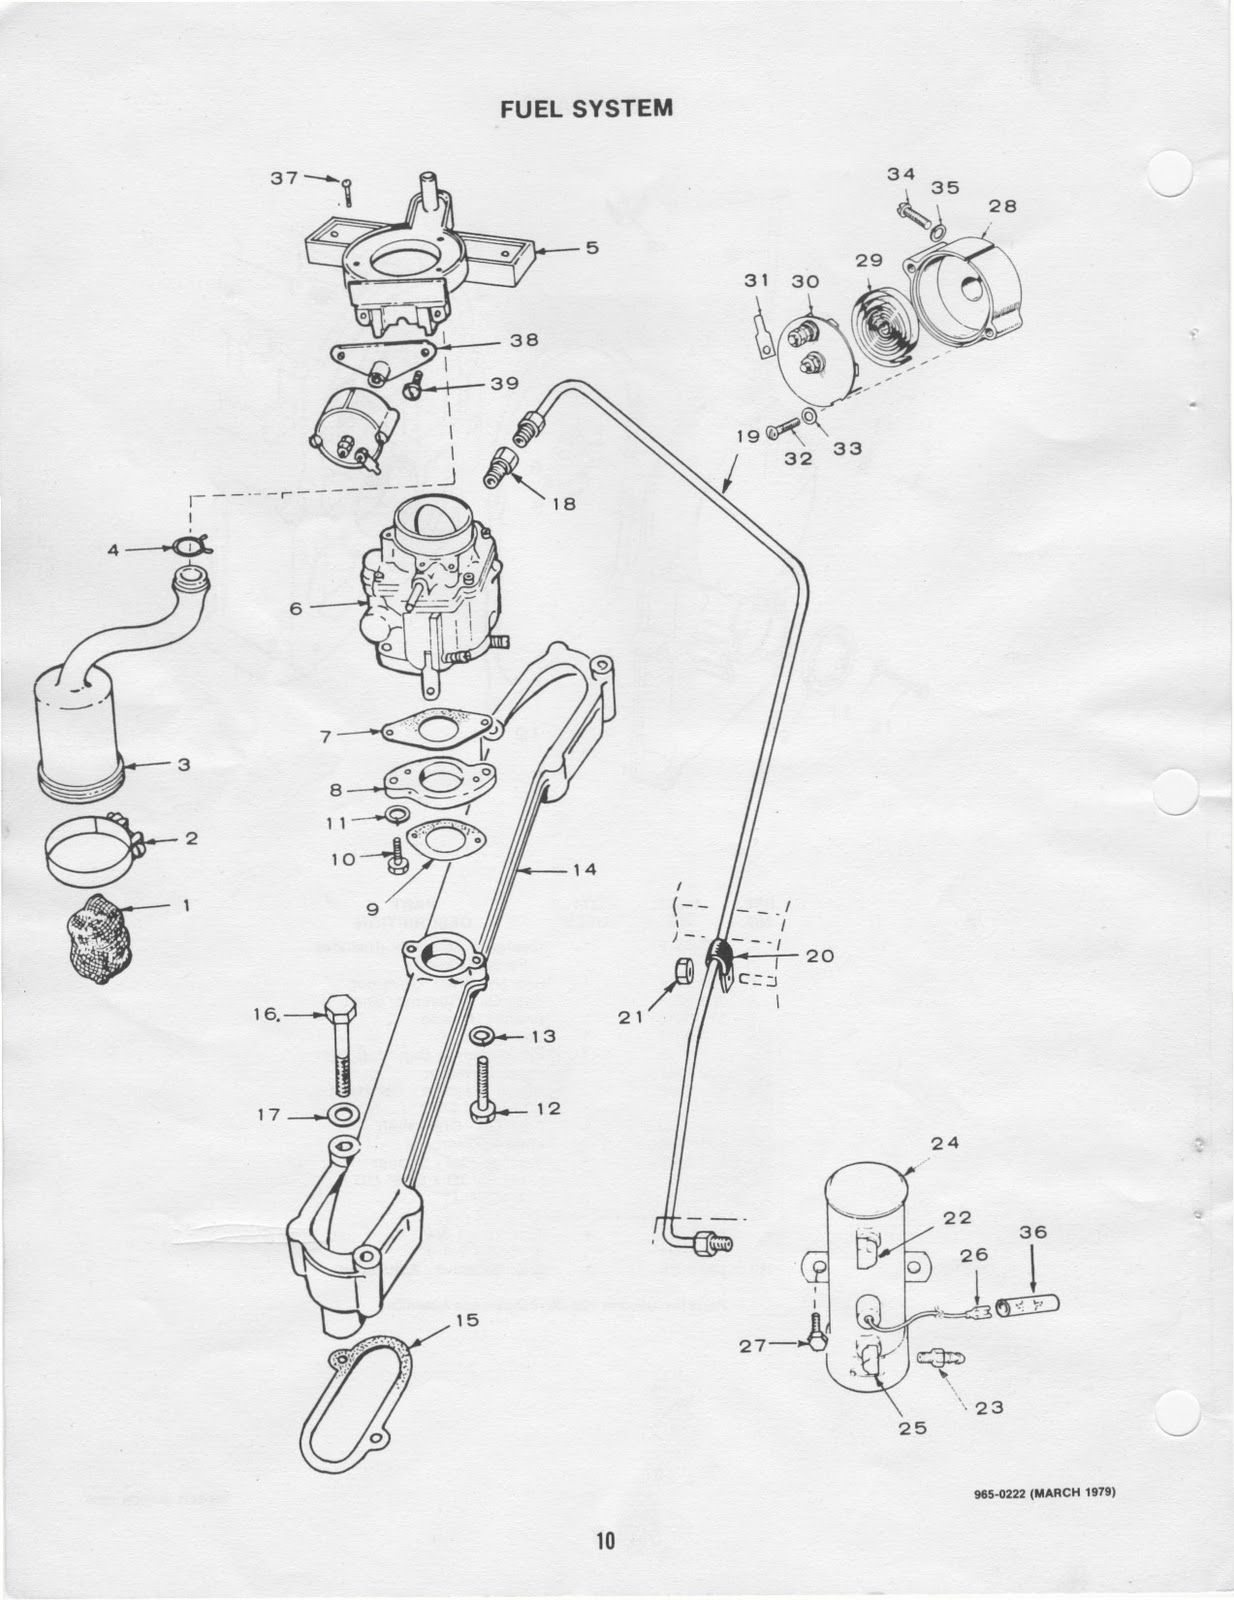 medium resolution of 6 5 kw onan wiring diagram onan control board operation onankohler rv generator wiring diagram kohler